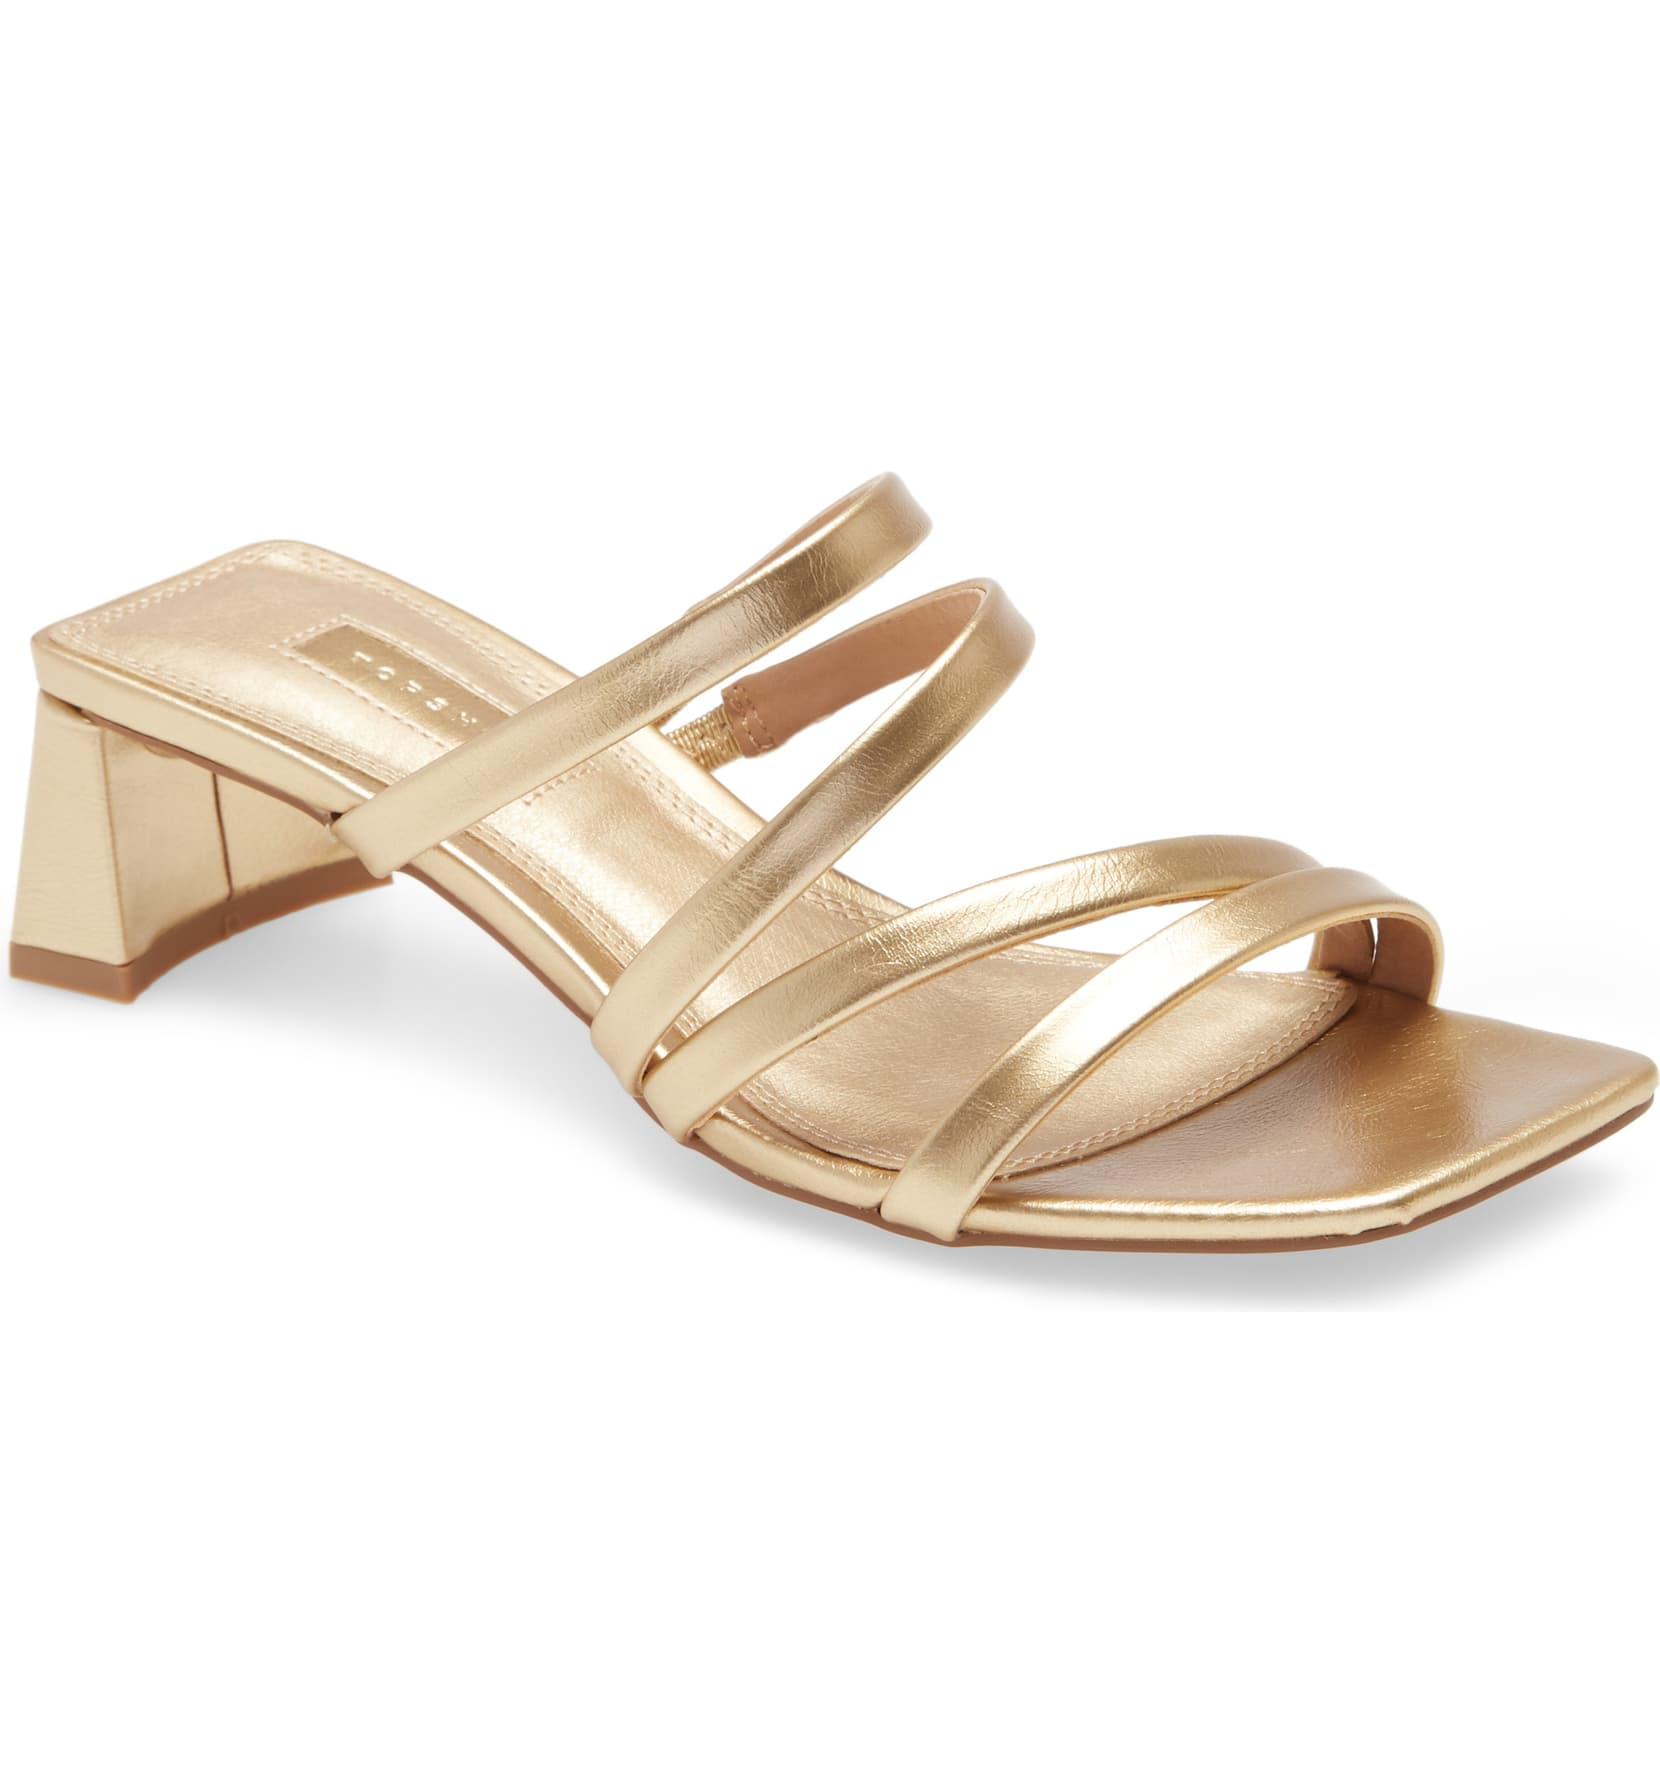 Topshop gold sandals